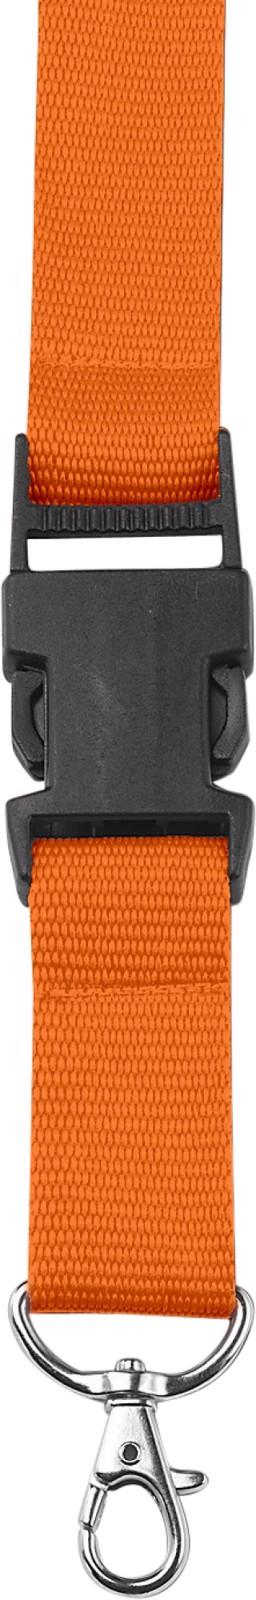 Polyester (300D) lanyard and key holder - Orange